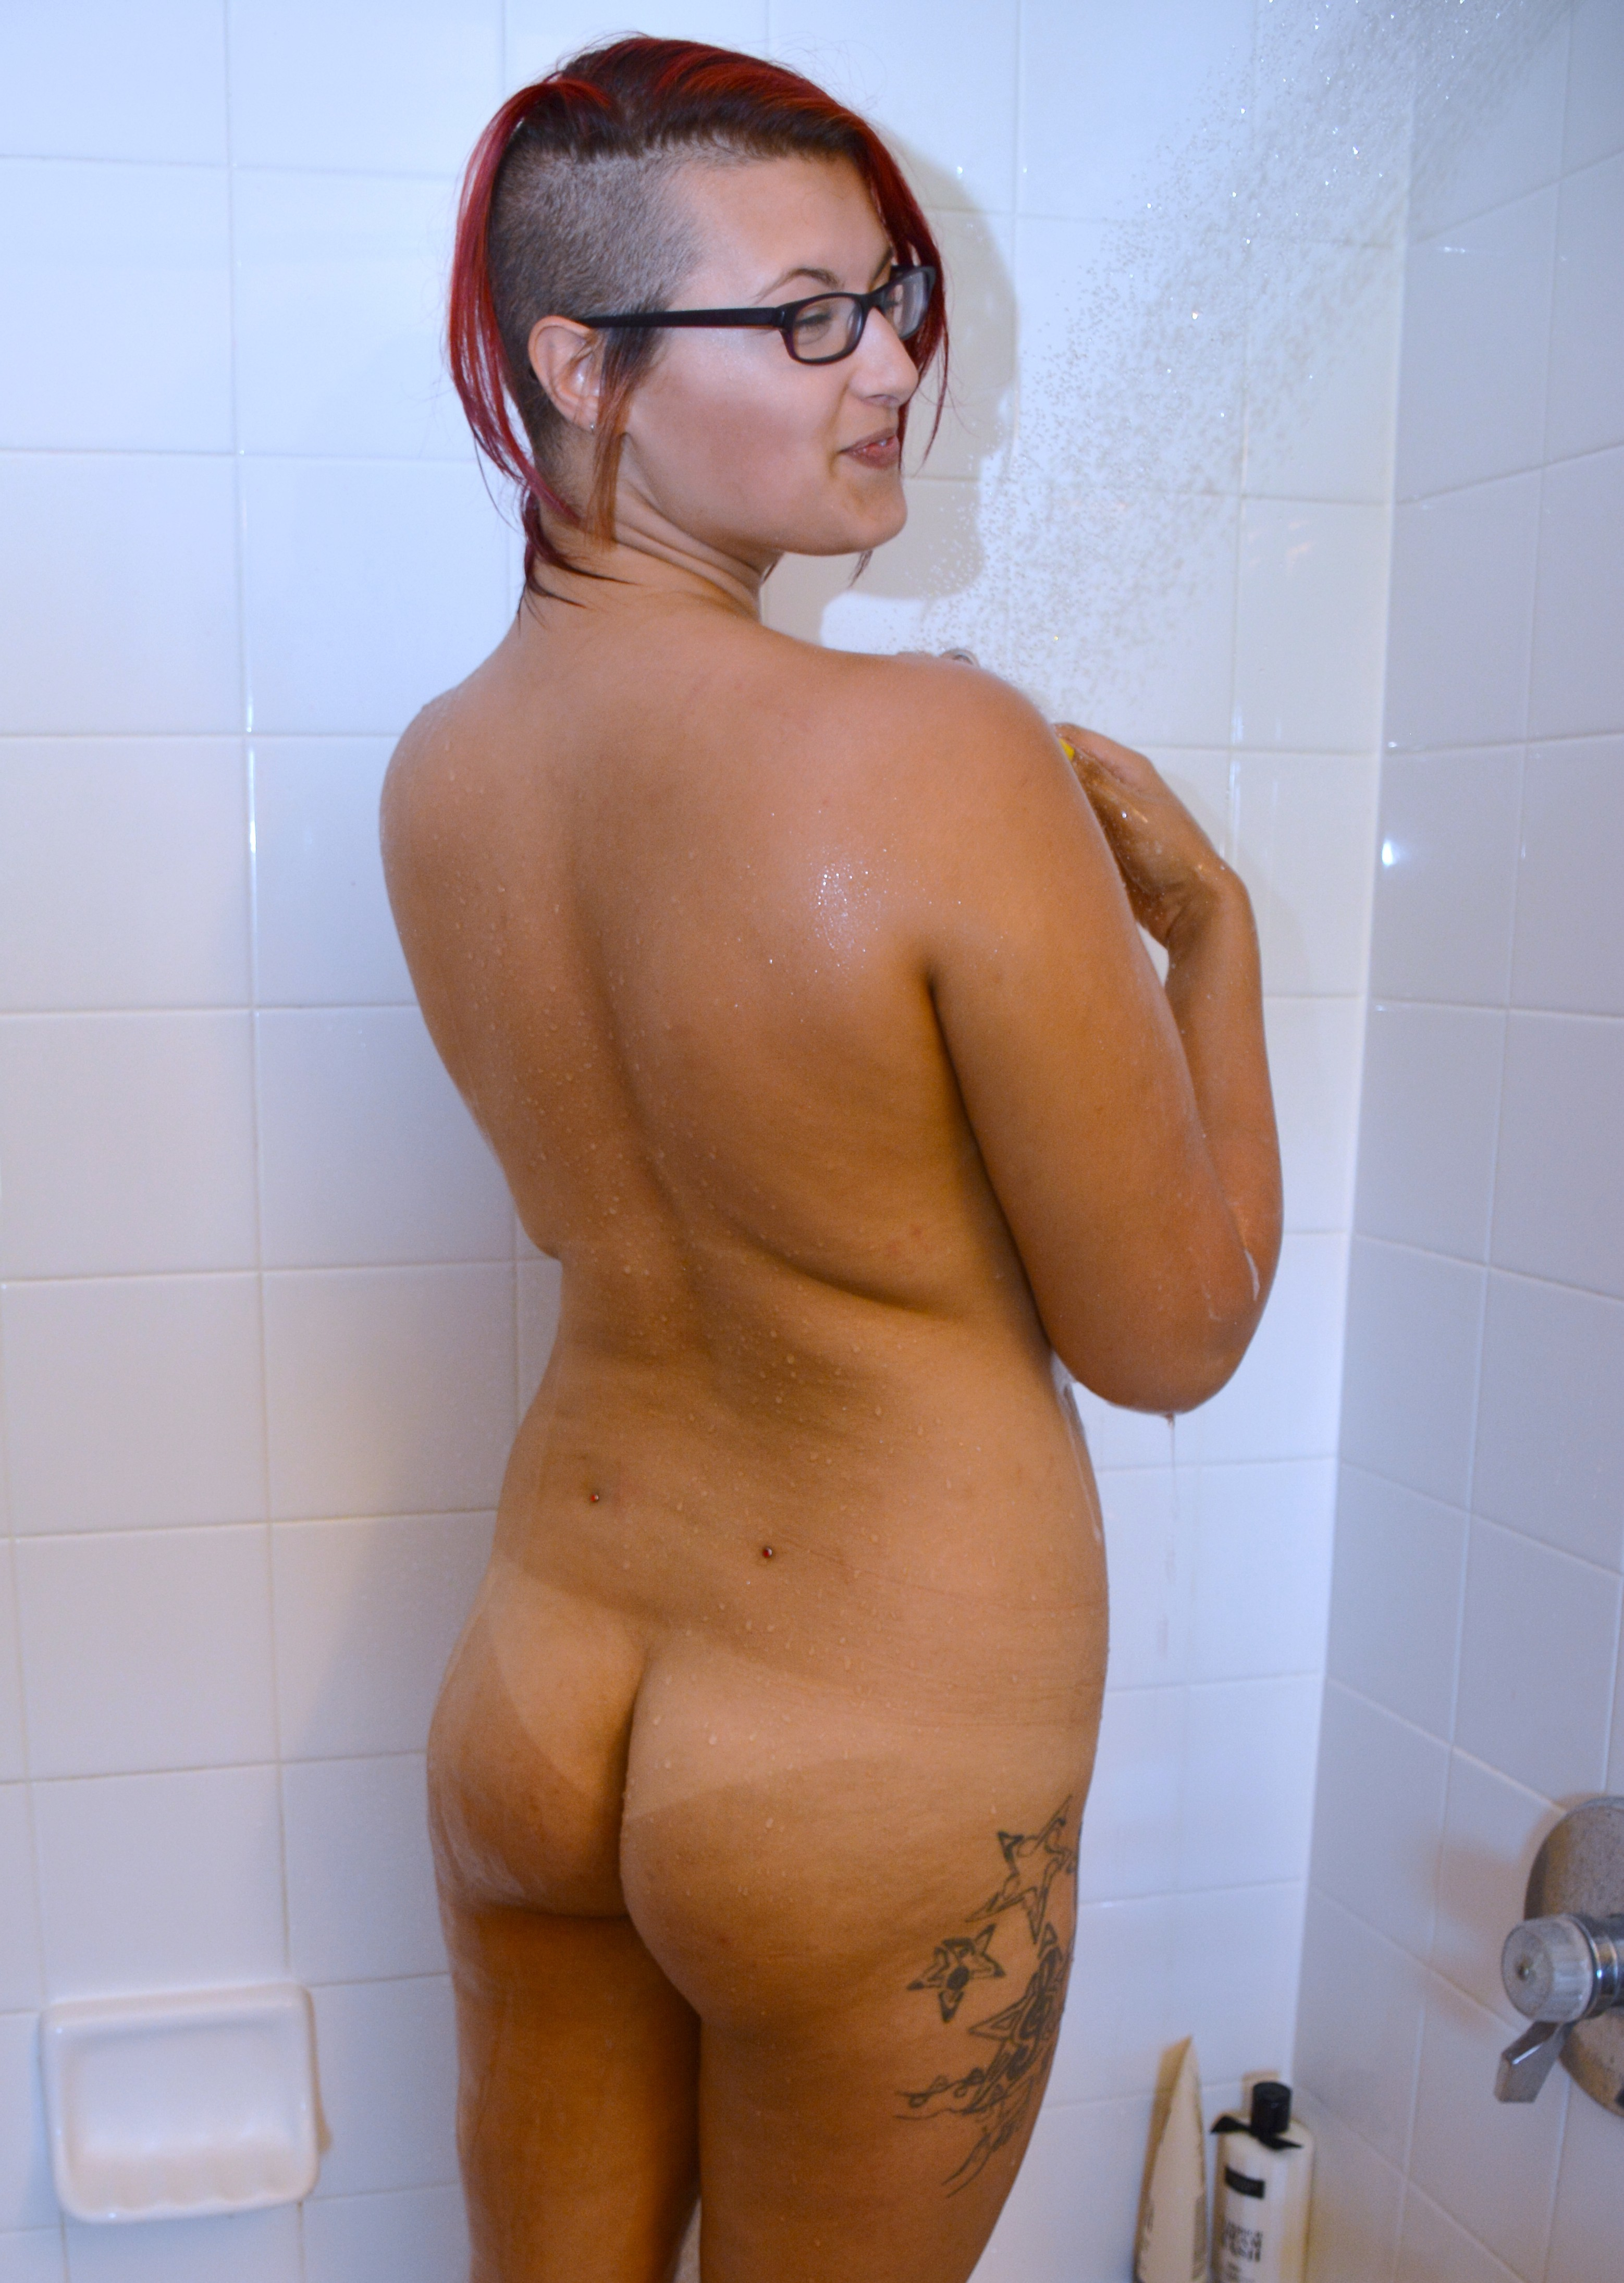 Эмили принимает душ